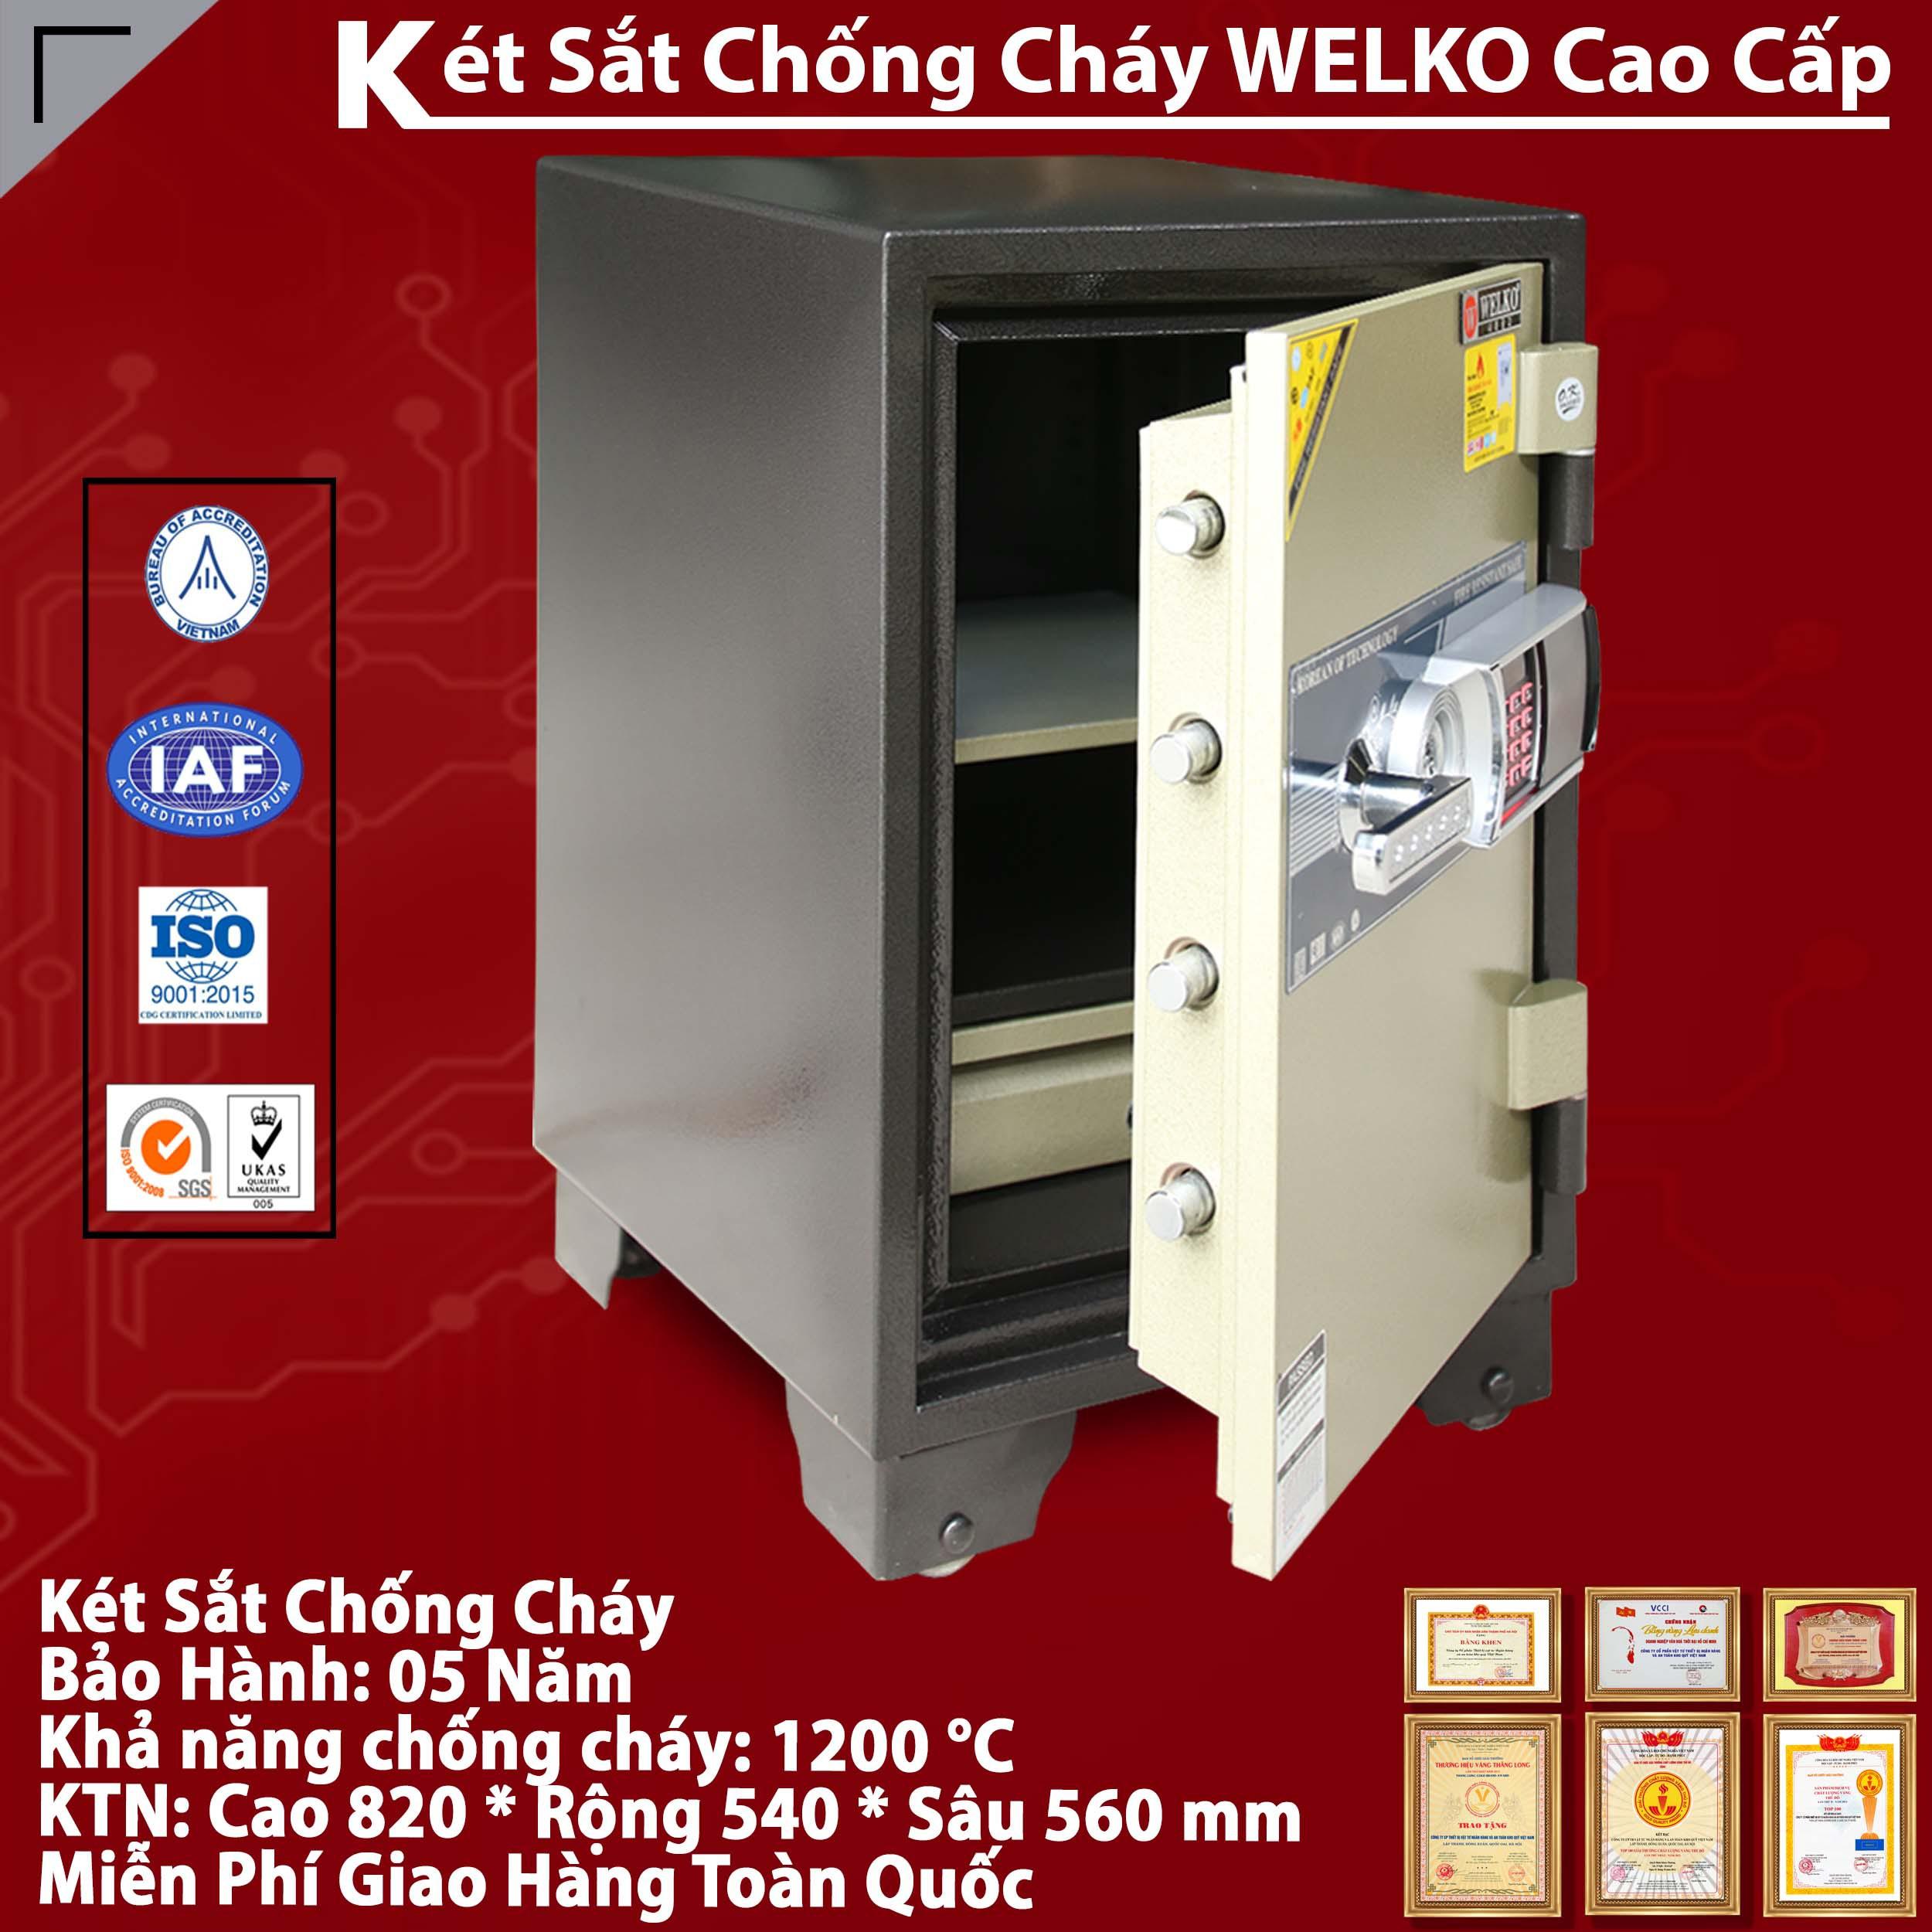 Ket Sat Van Phong Cao Cap Chat Luong Cao